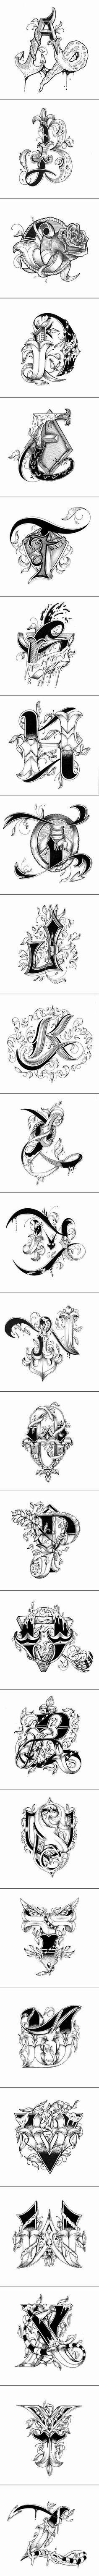 Best Lettering Design Alphabet - Luxury Best Lettering Design Alphabet , Letter and Symbol Misrecognition In Highly Legible Typefaces for Calligraphy Letters, Typography Letters, Alphabet Fonts, Alphabet Design, Alphabet Art, Graffiti Lettering, Lettering Design, Graffiti Alphabet, Creative Lettering